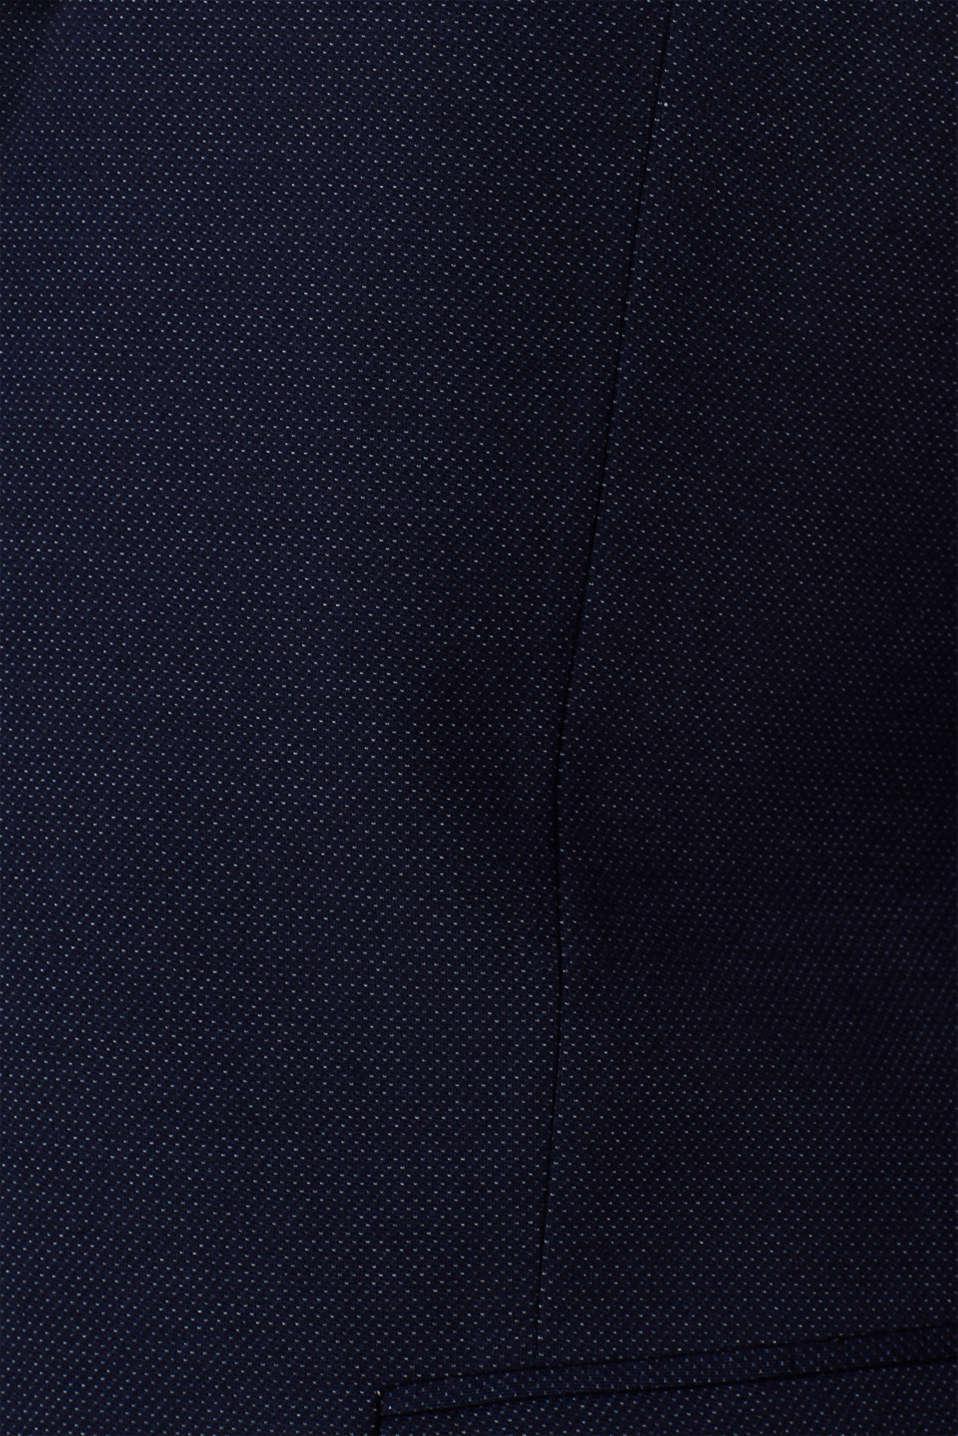 COMFORT SUIT mix + match: Textured jacket, NAVY, detail image number 5